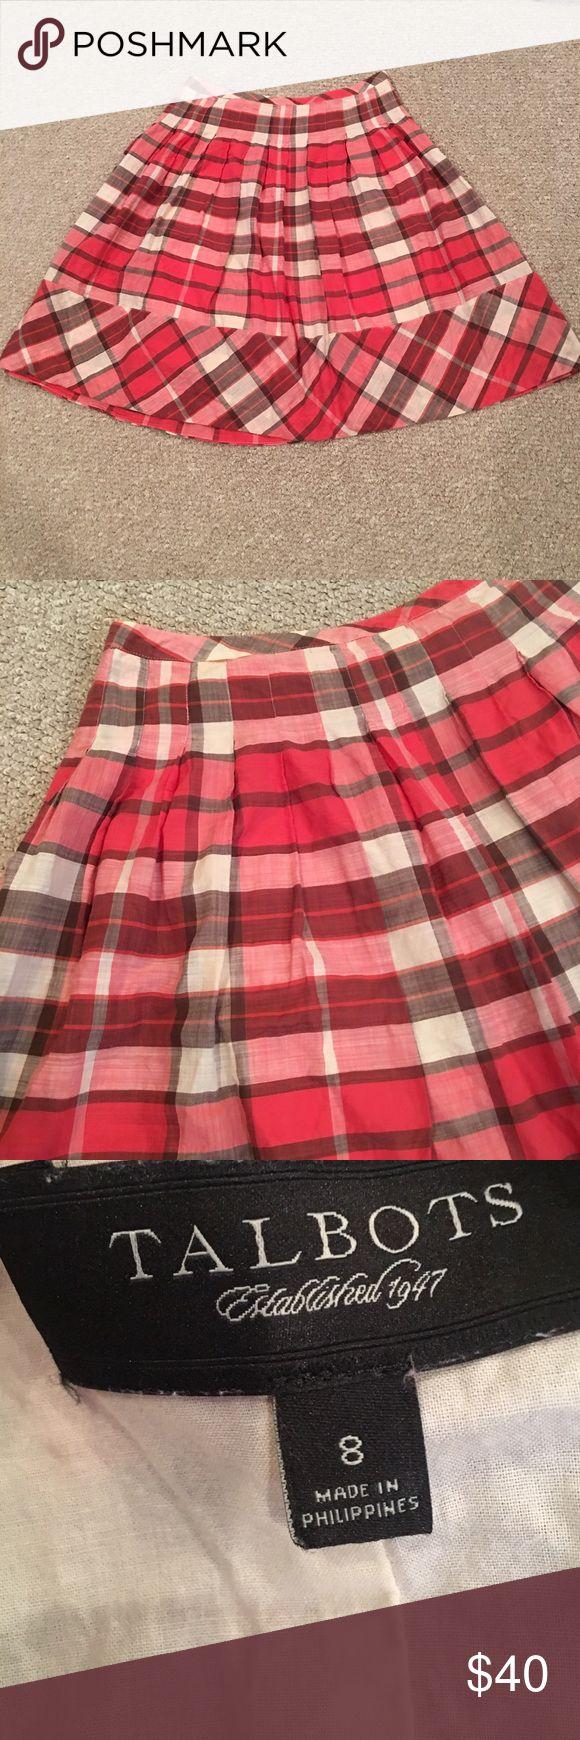 Talbots Red Plaid Pleated Skirt Adorable Round Pleated Plaid Skirt with side Zipper. Talbots Skirts Midi